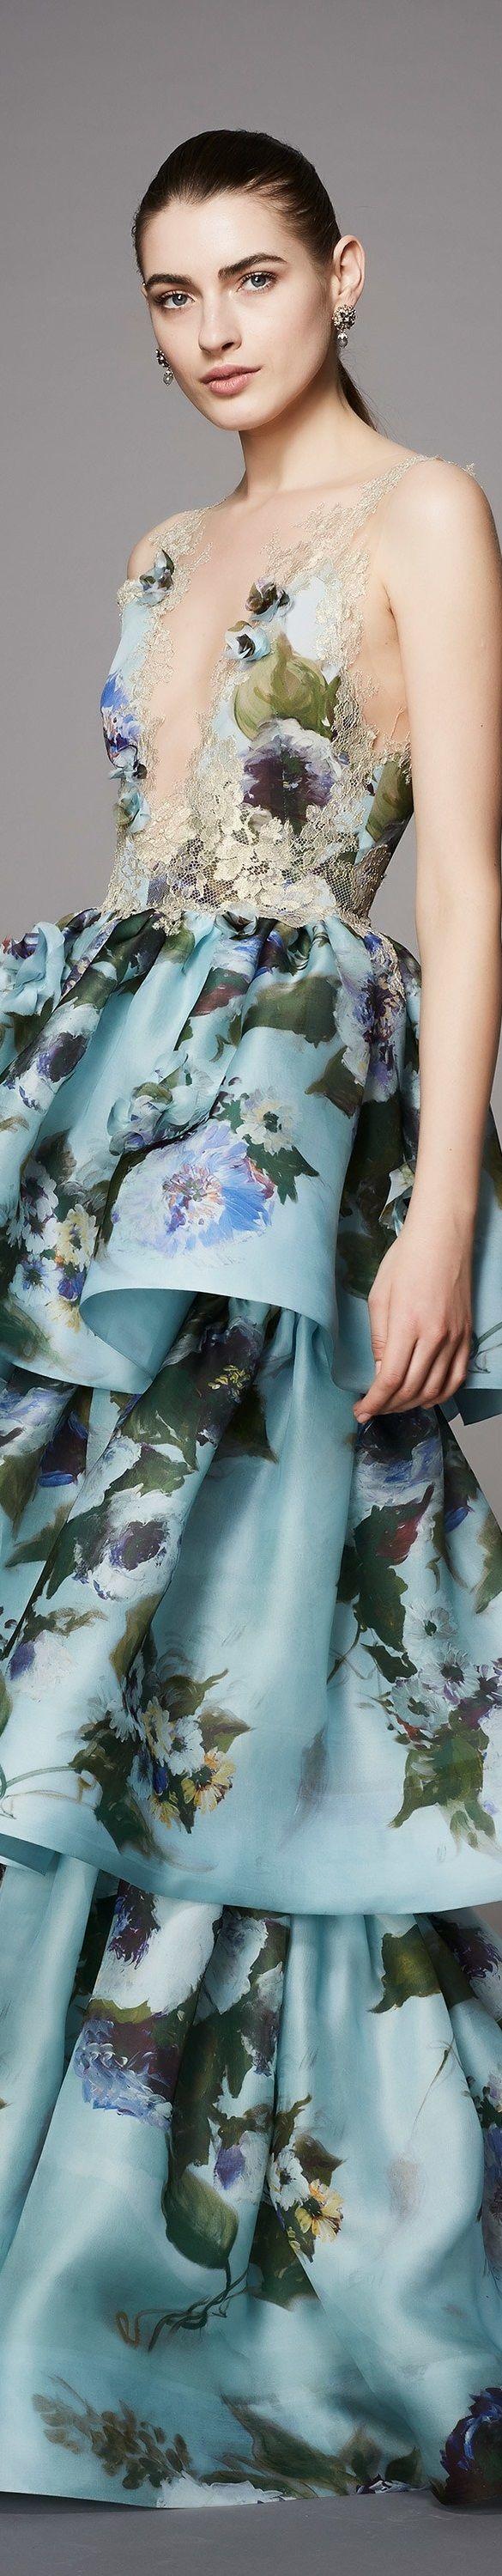 Marchesa couture pre fall 2017 vogue